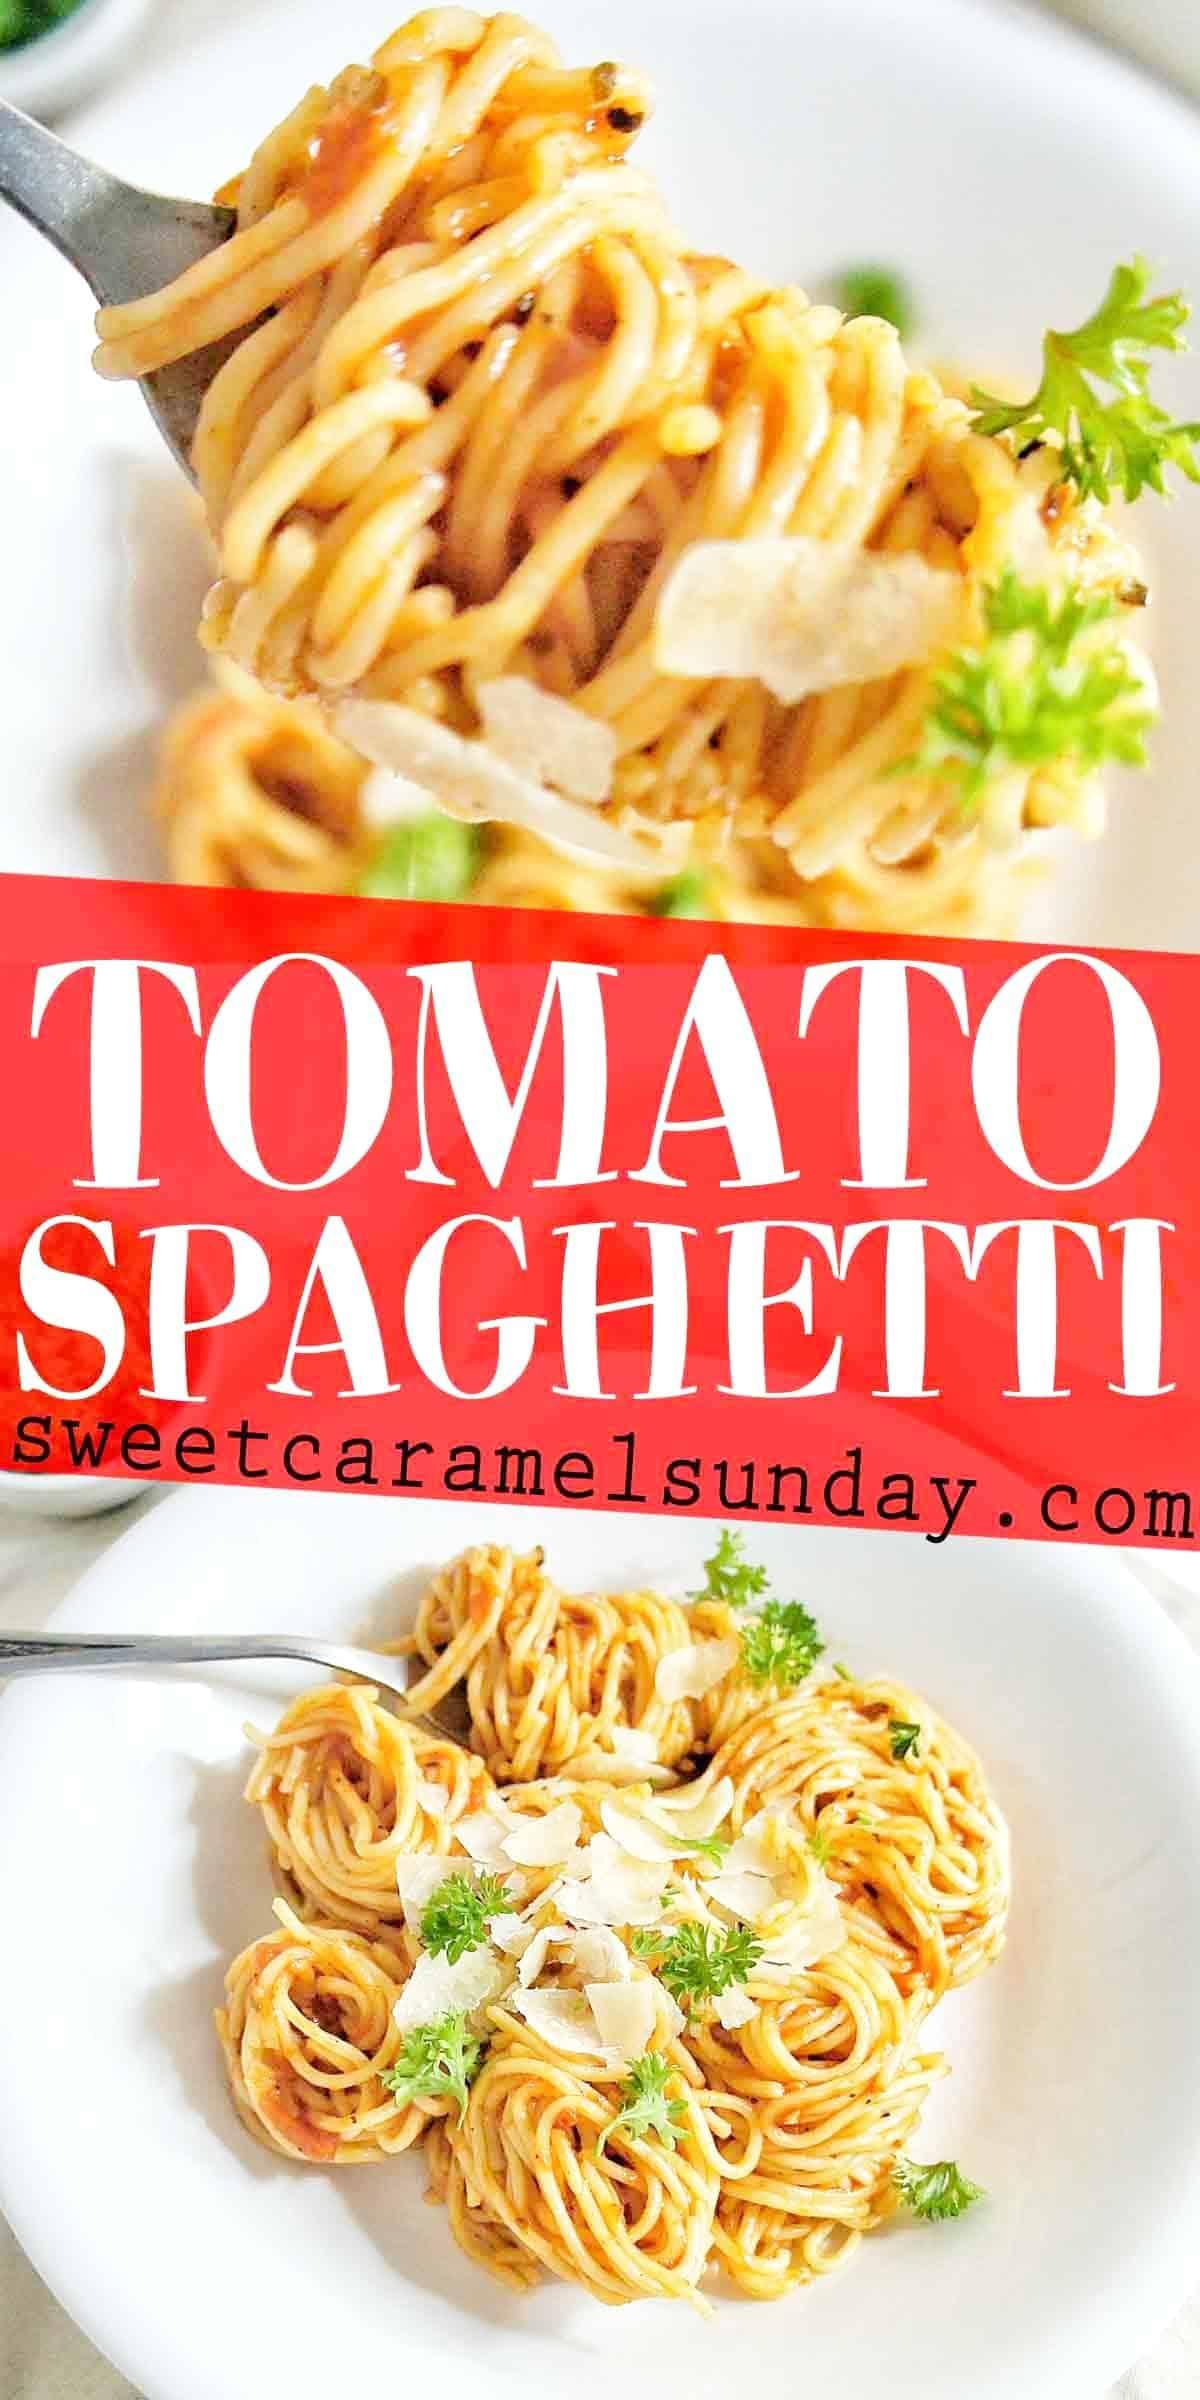 Tomato Spaghetti with text overlay